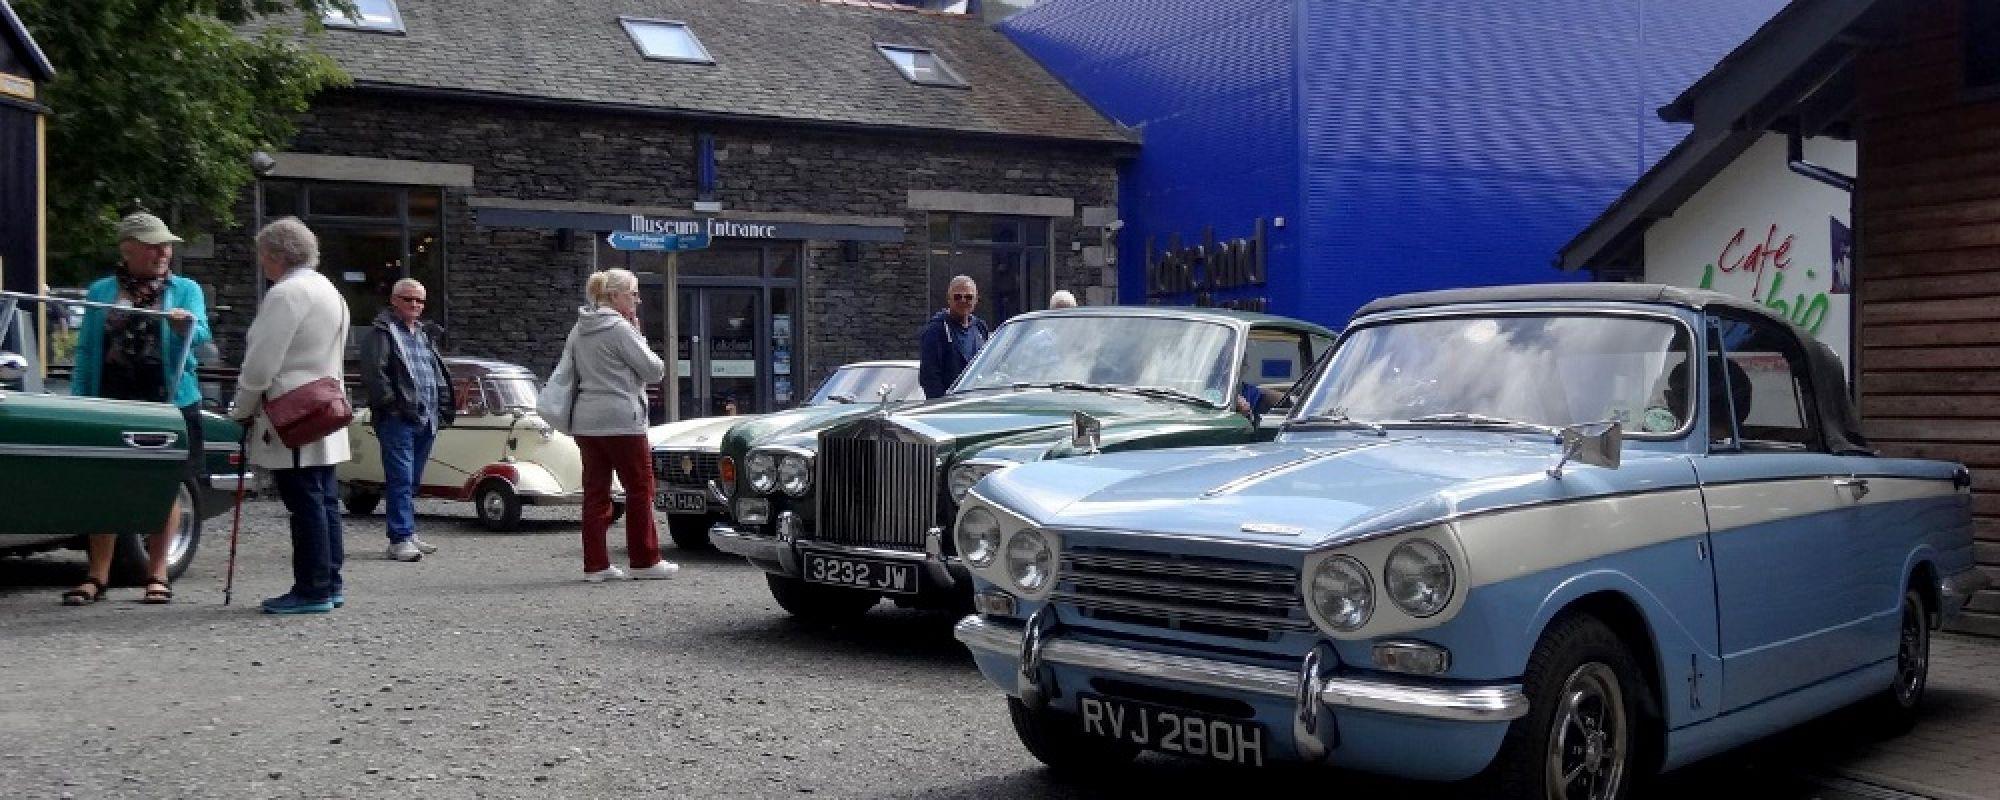 Lakeland Historic Car Club